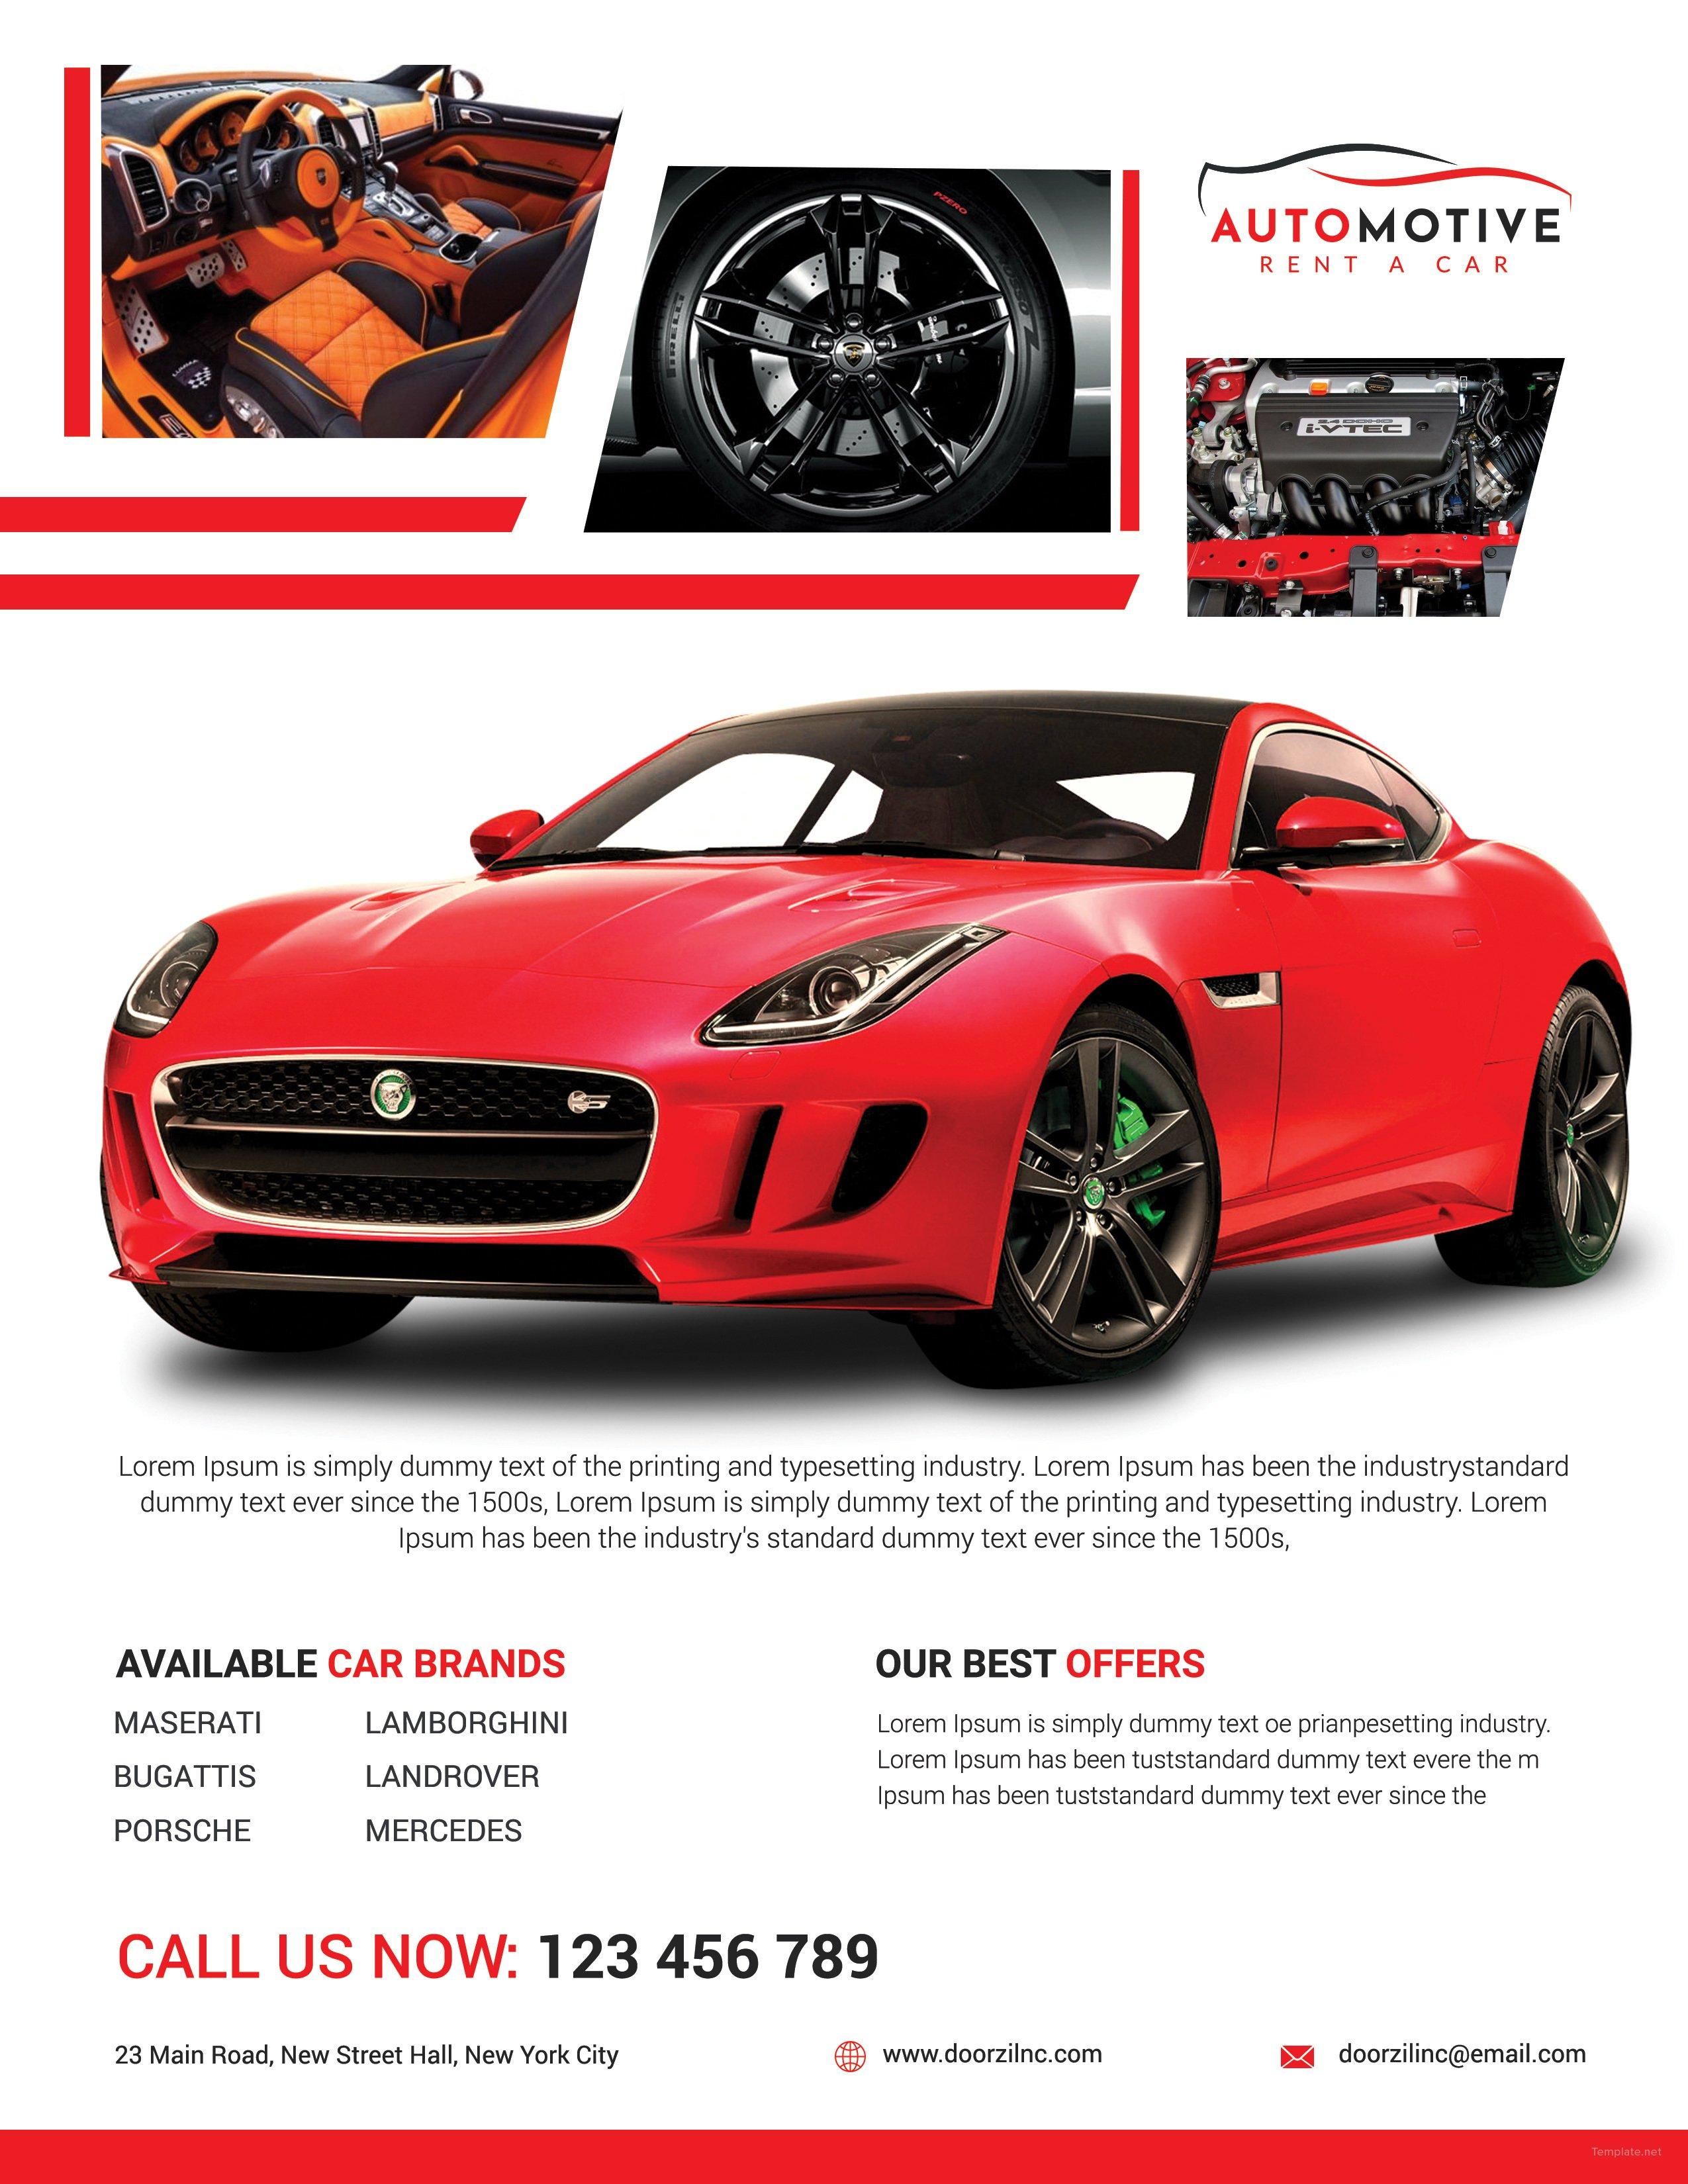 Car Sales Flyer Template In Adobe Photoshop, Illustrator | Template.net